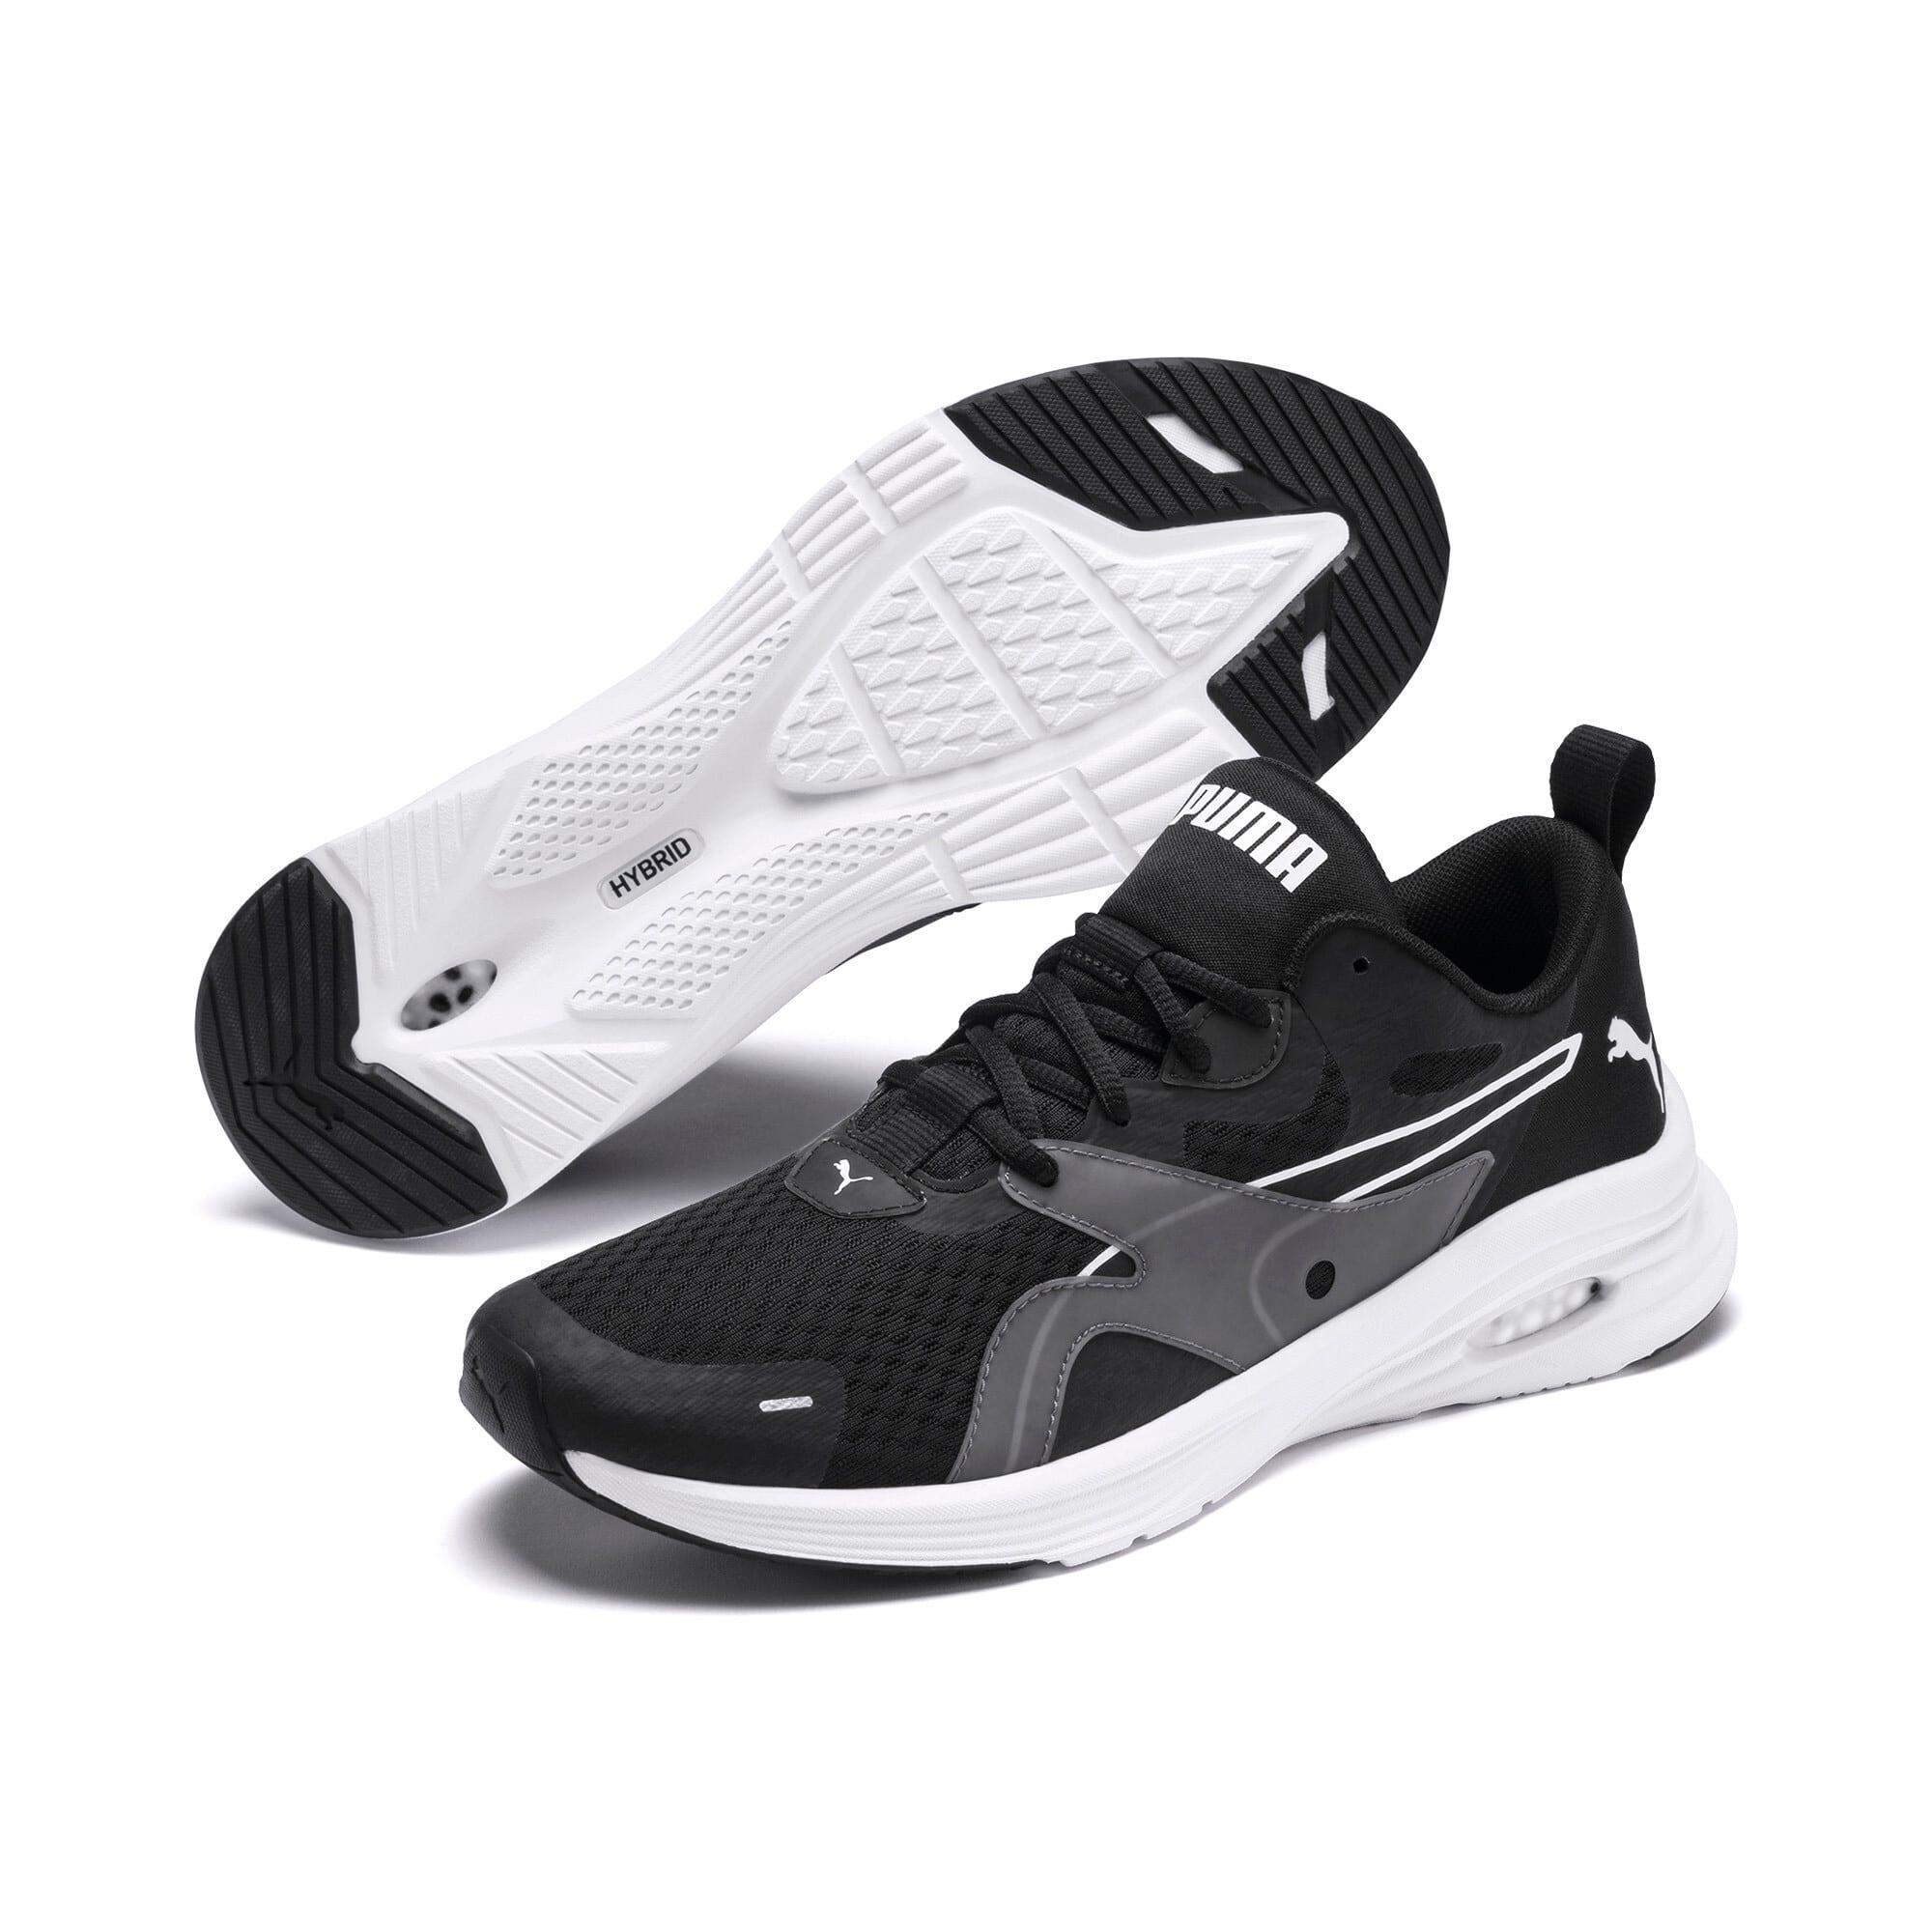 Thumbnail 3 of HYBRID Fuego Men's Running Shoes, Puma Black-Puma White, medium